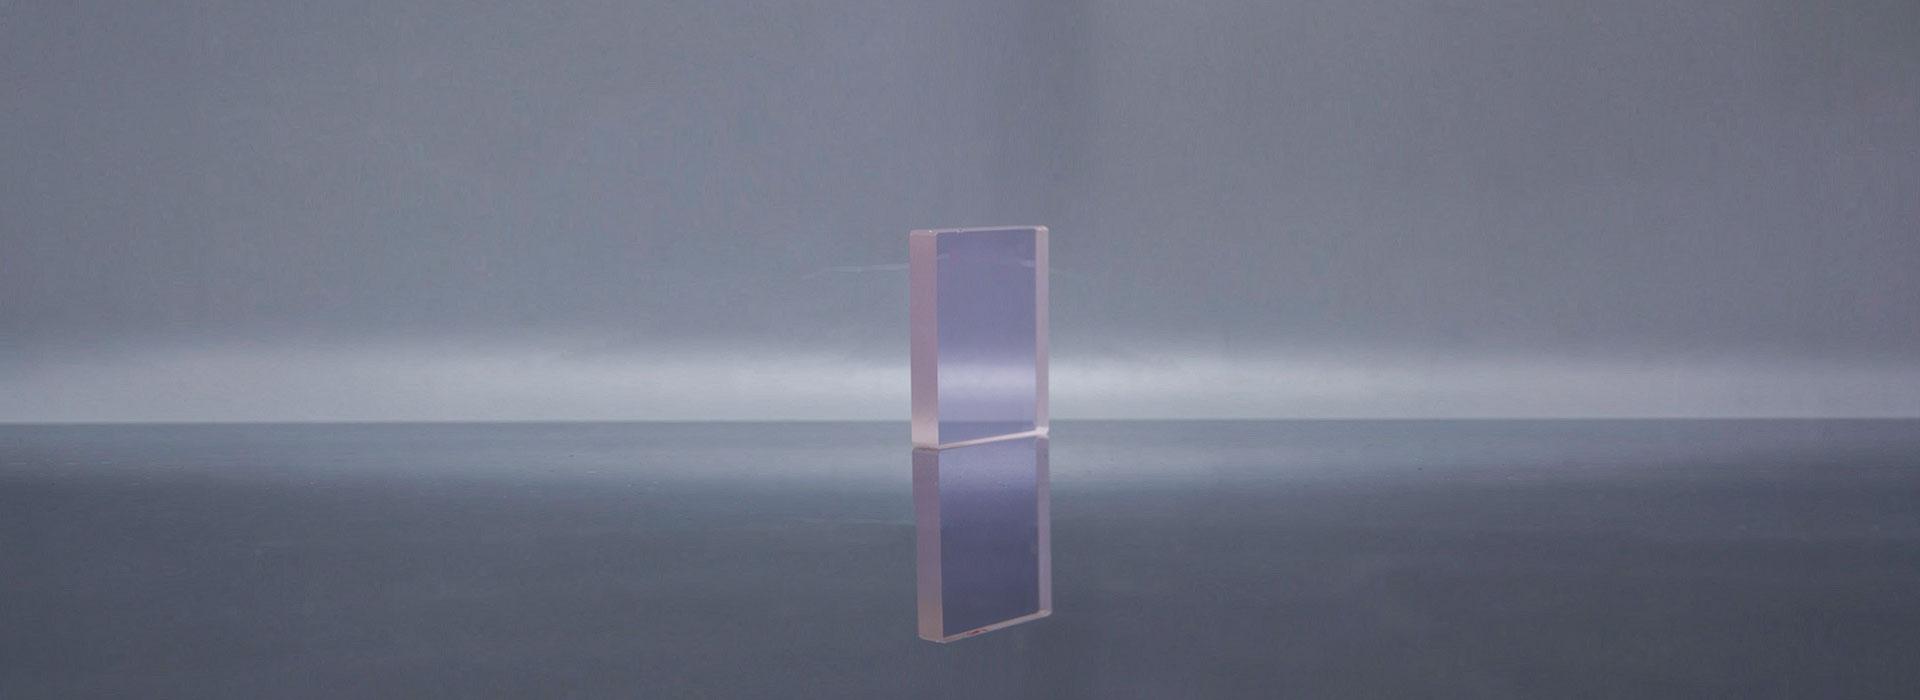 Nd-YAP-激光晶体-南京光宝-CRYLINK